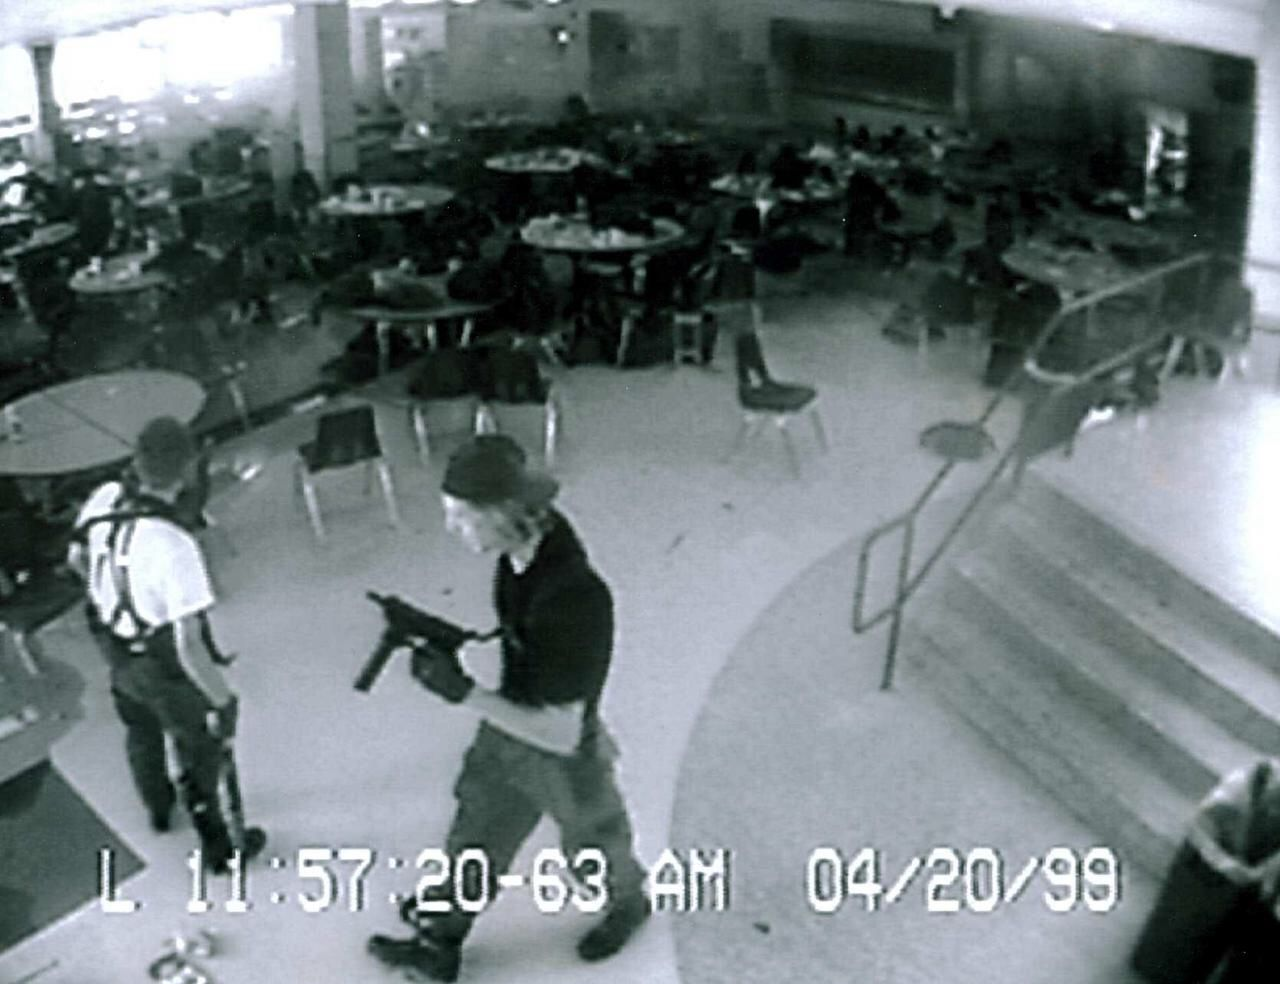 Columbine High School Shooting Cctv Footage